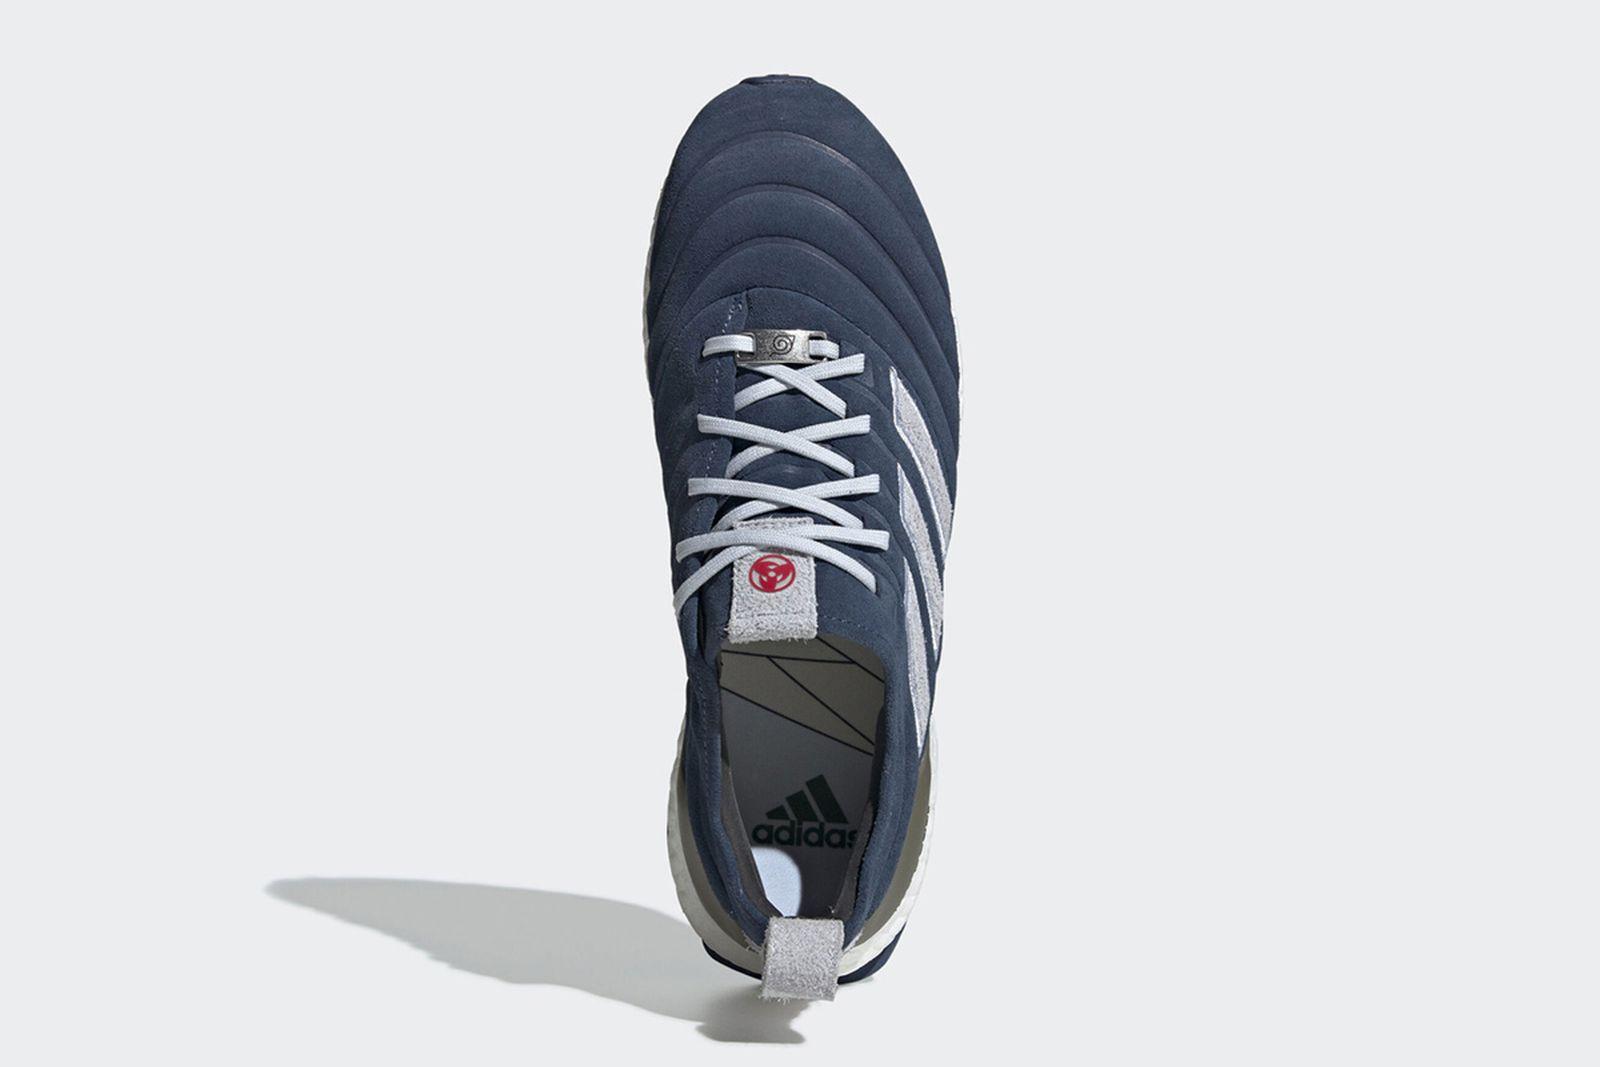 naruto x adidas copa ultraboost kakashi release date price